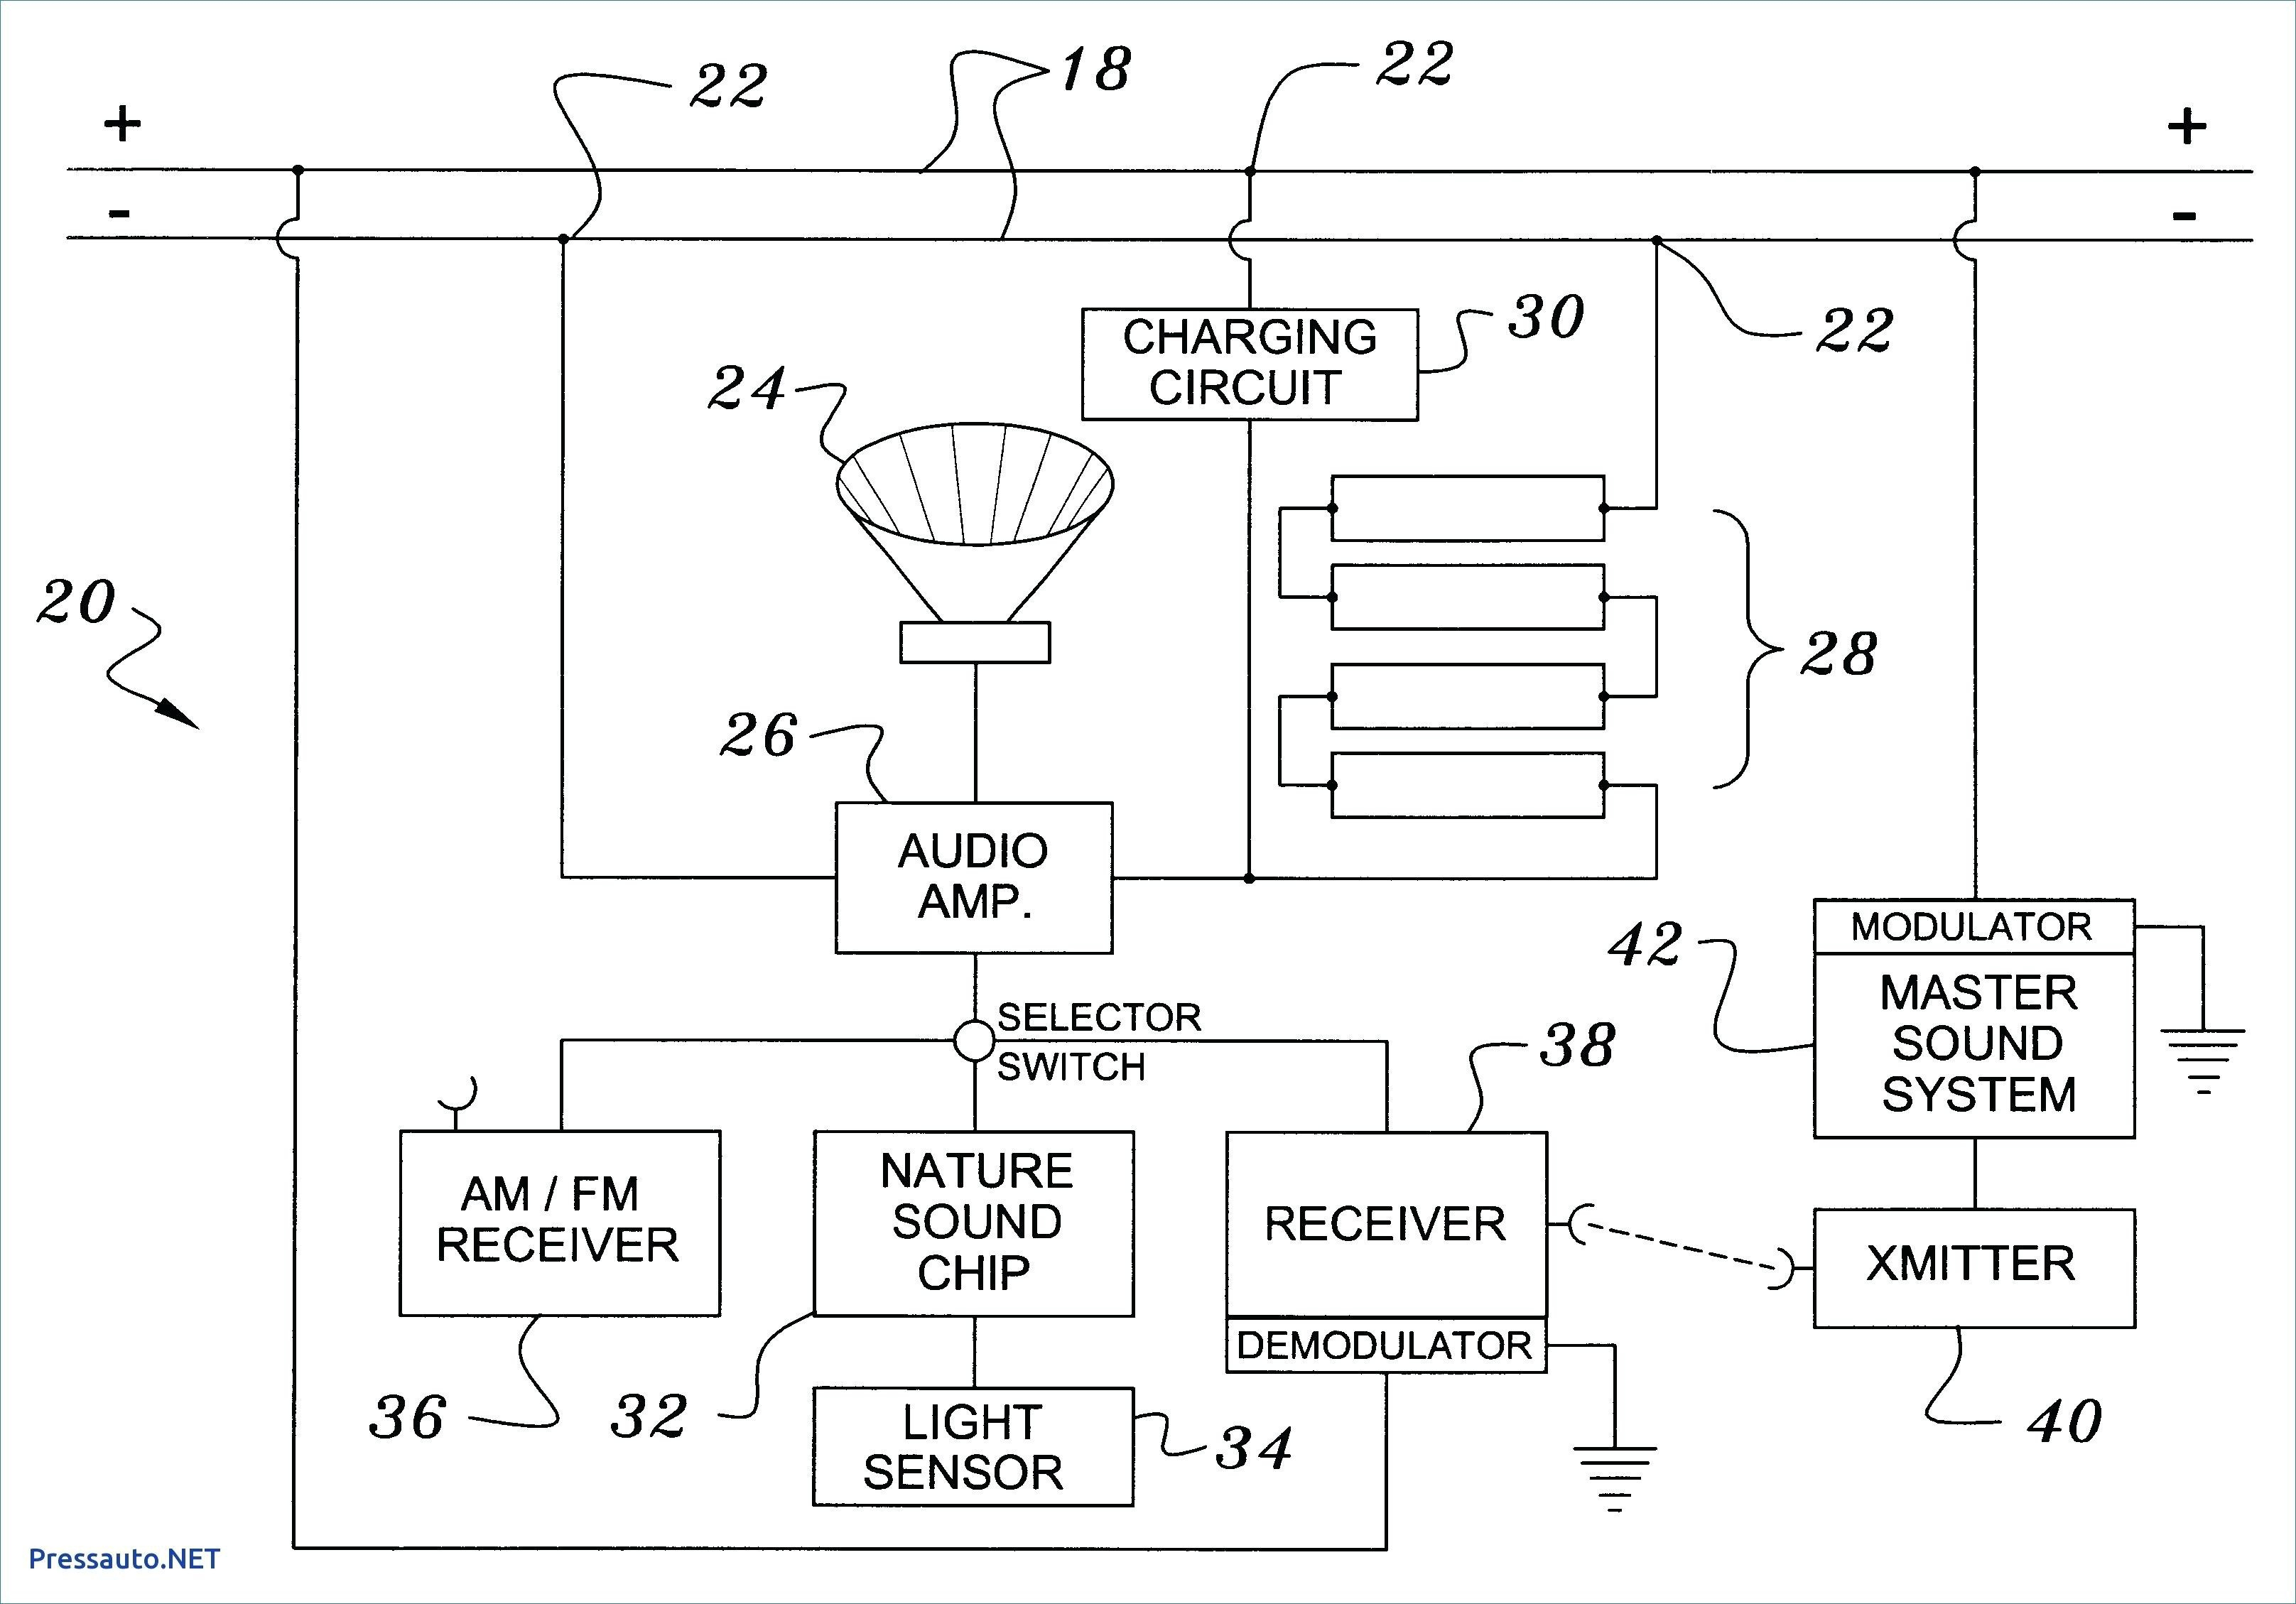 480 Volt Lighting Circuit Diagram   Wiring Diagram - 277 Volt Lighting Wiring Diagram